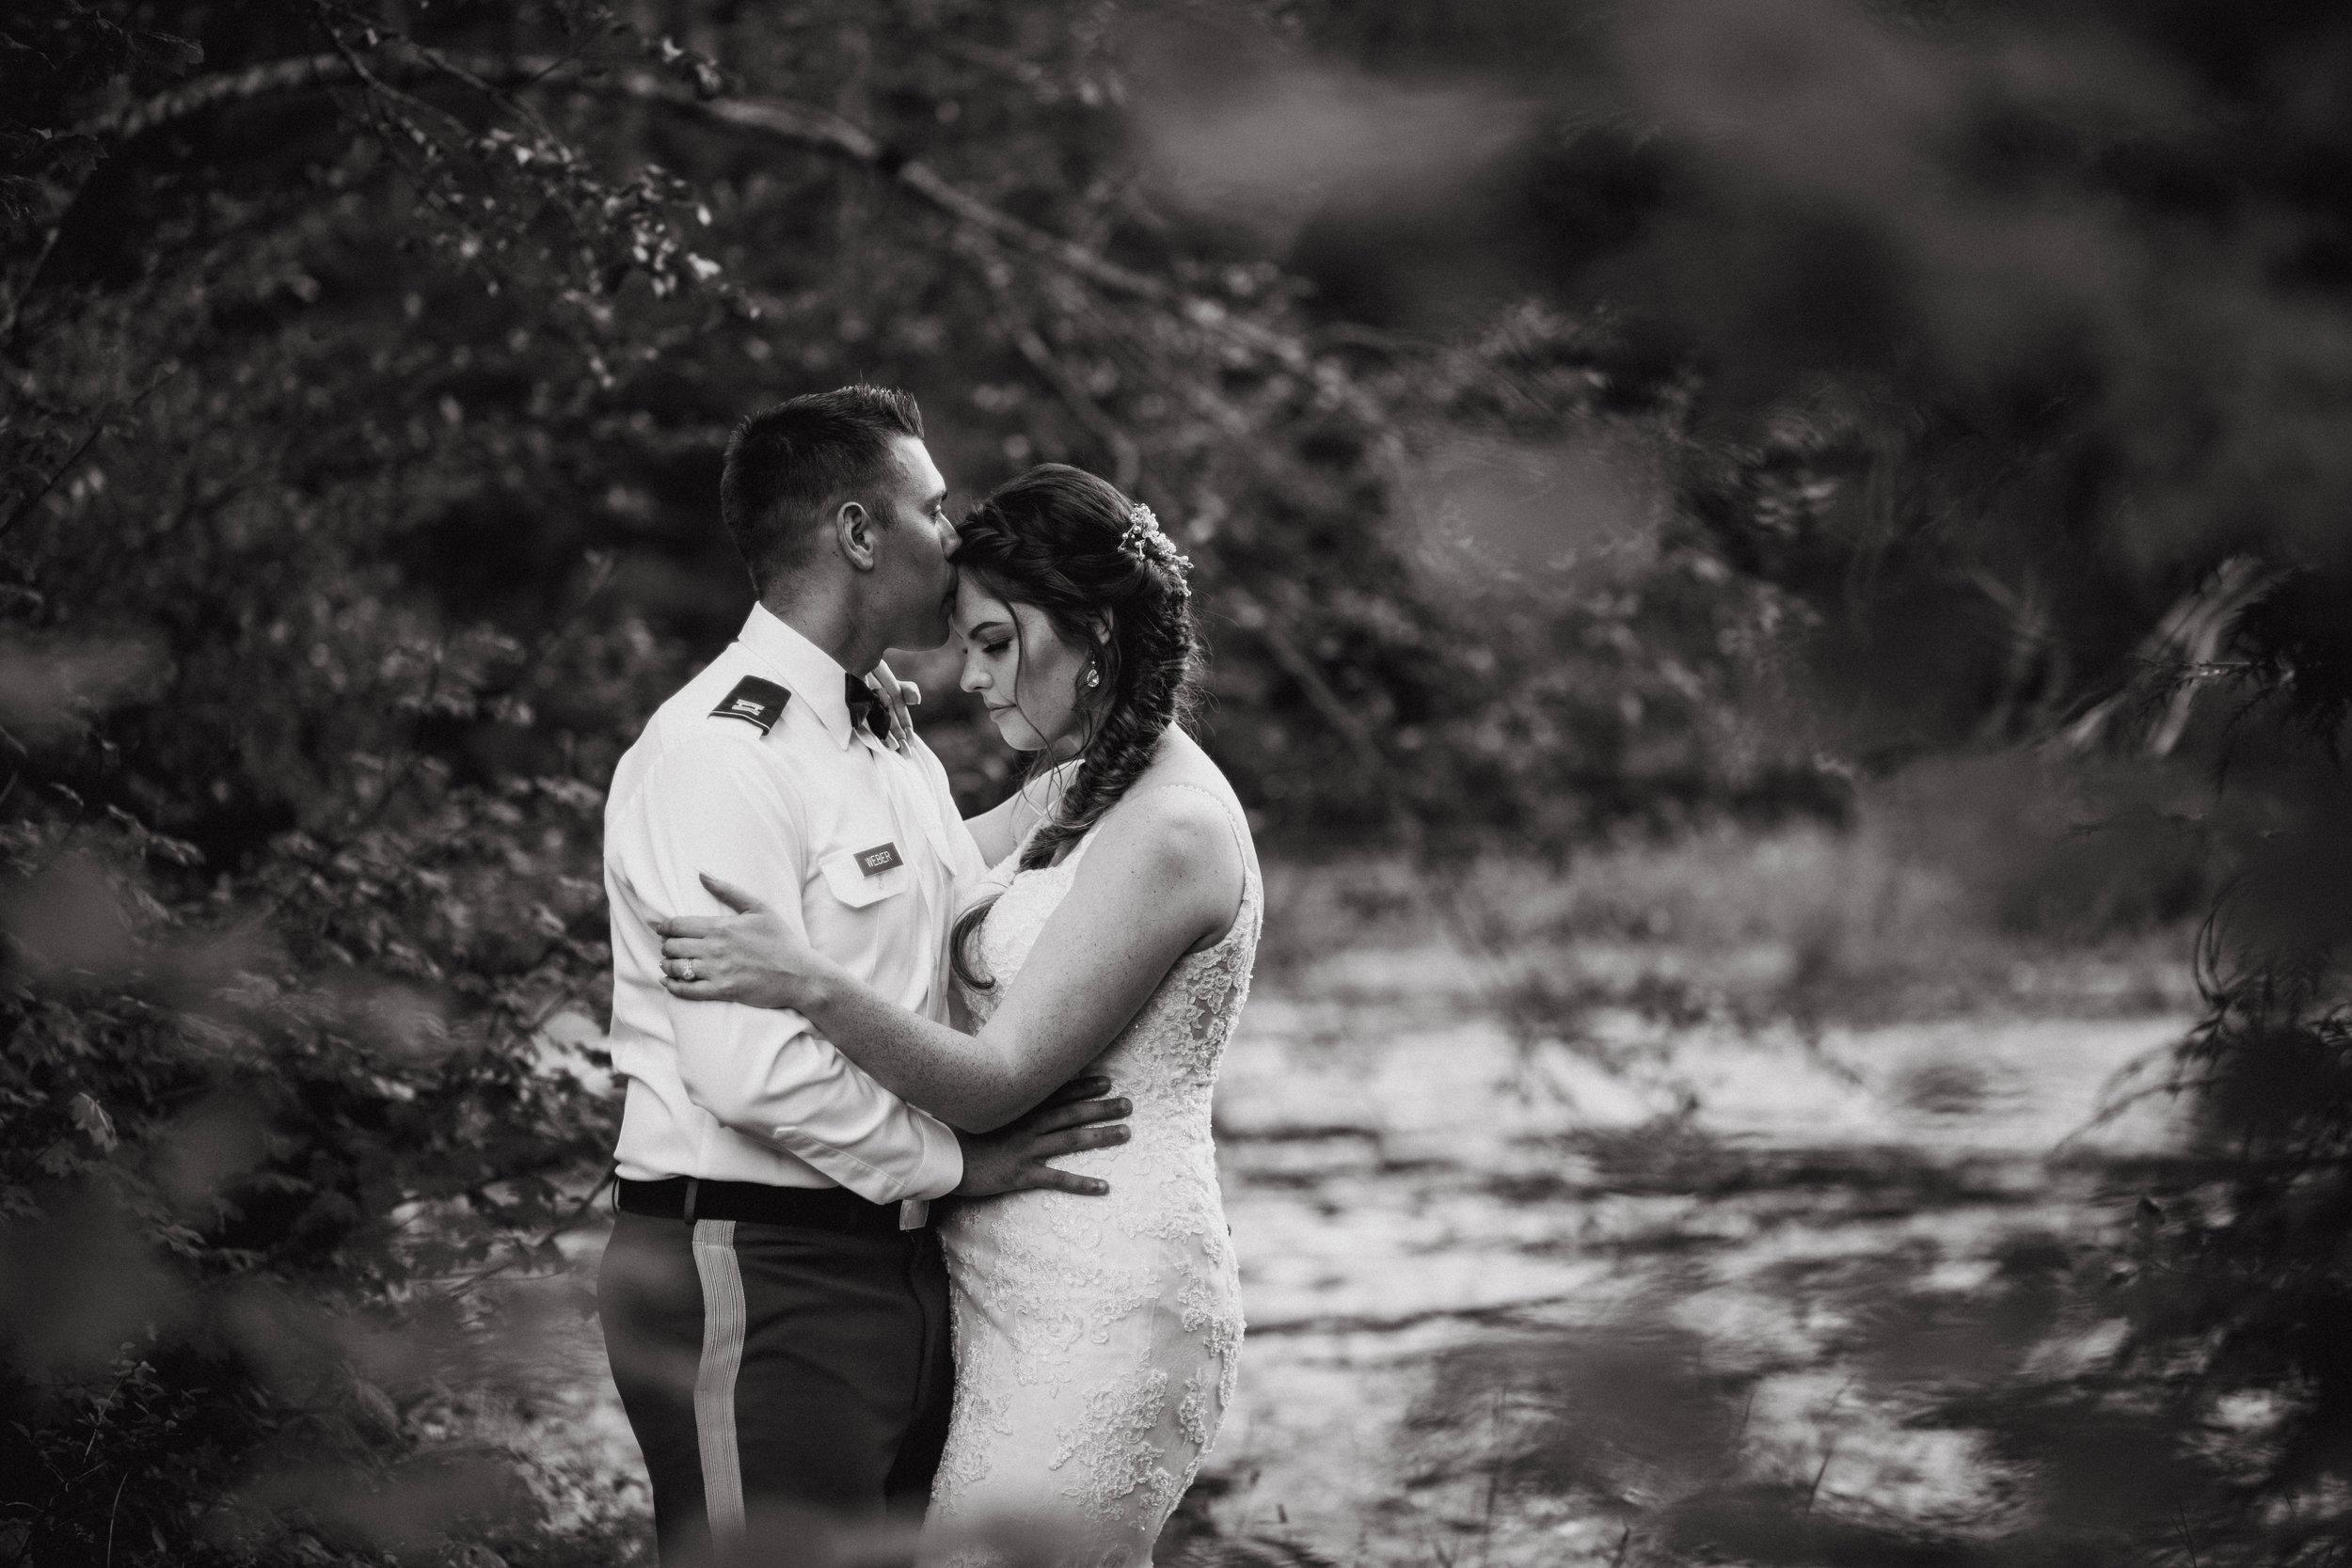 Jessica + Michael Portraits-  Sarah Gonia Photography (205 of 211).jpg